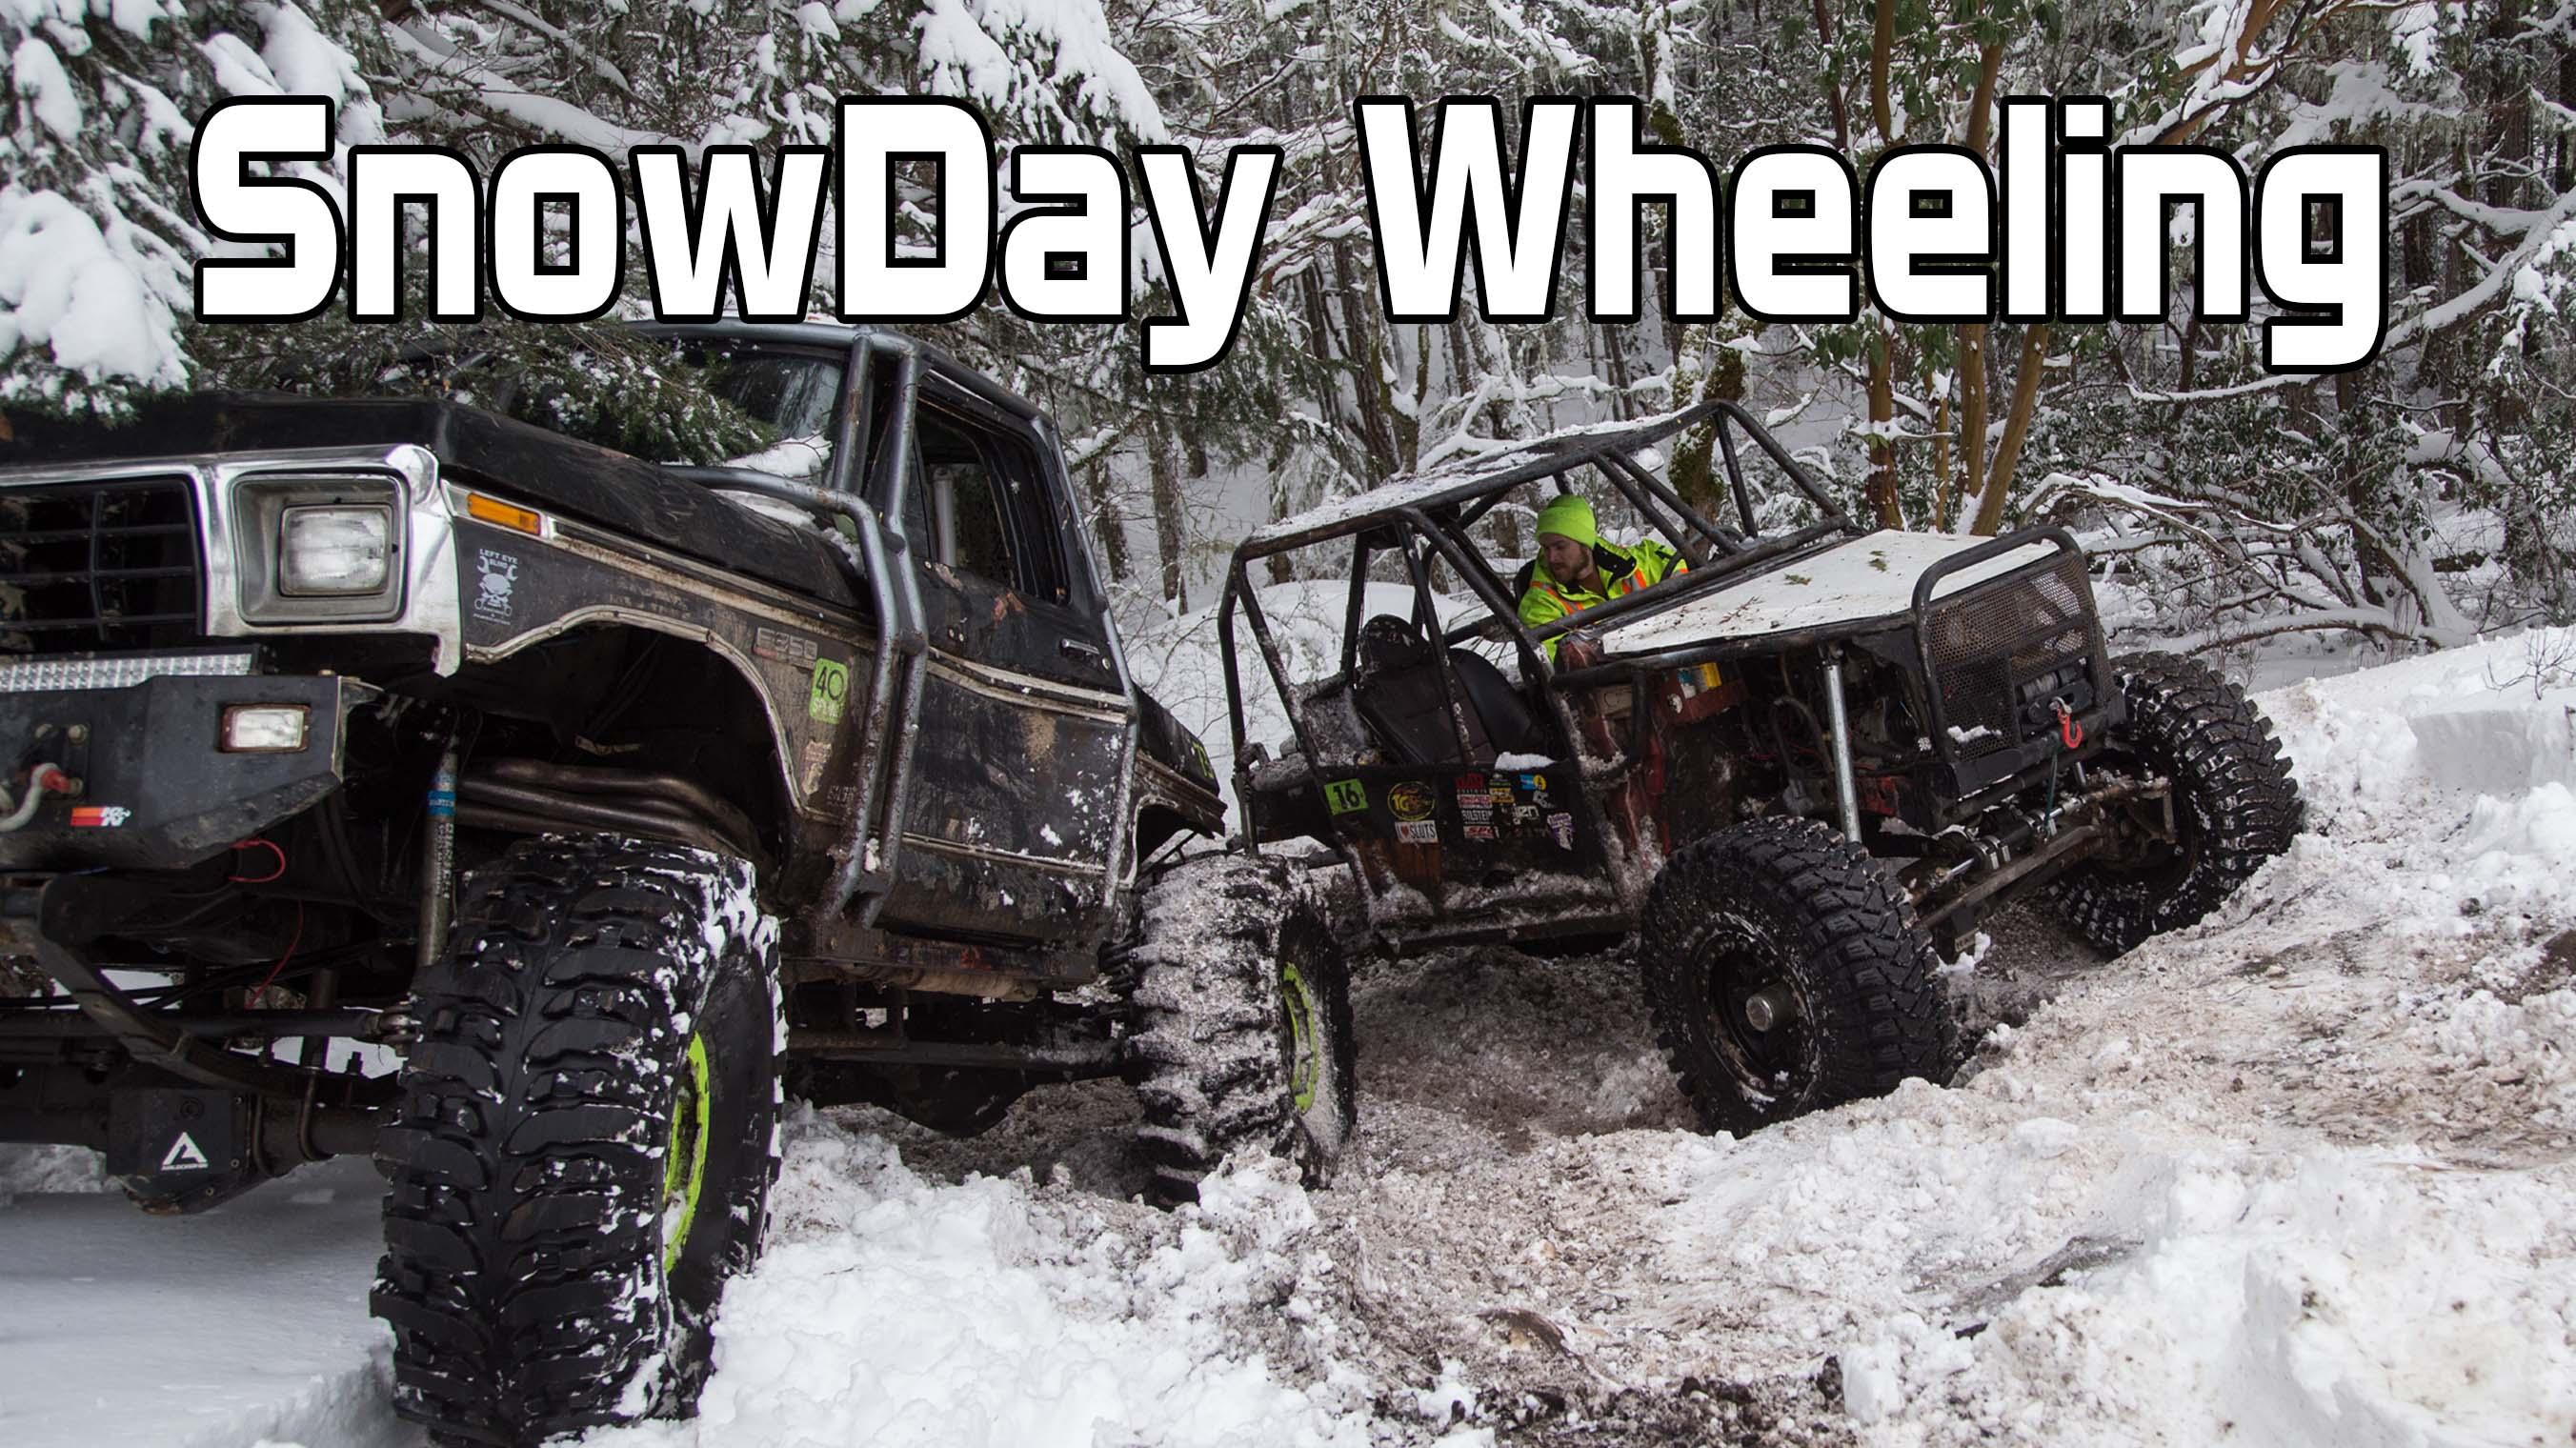 Snow Day Trail Wheeling